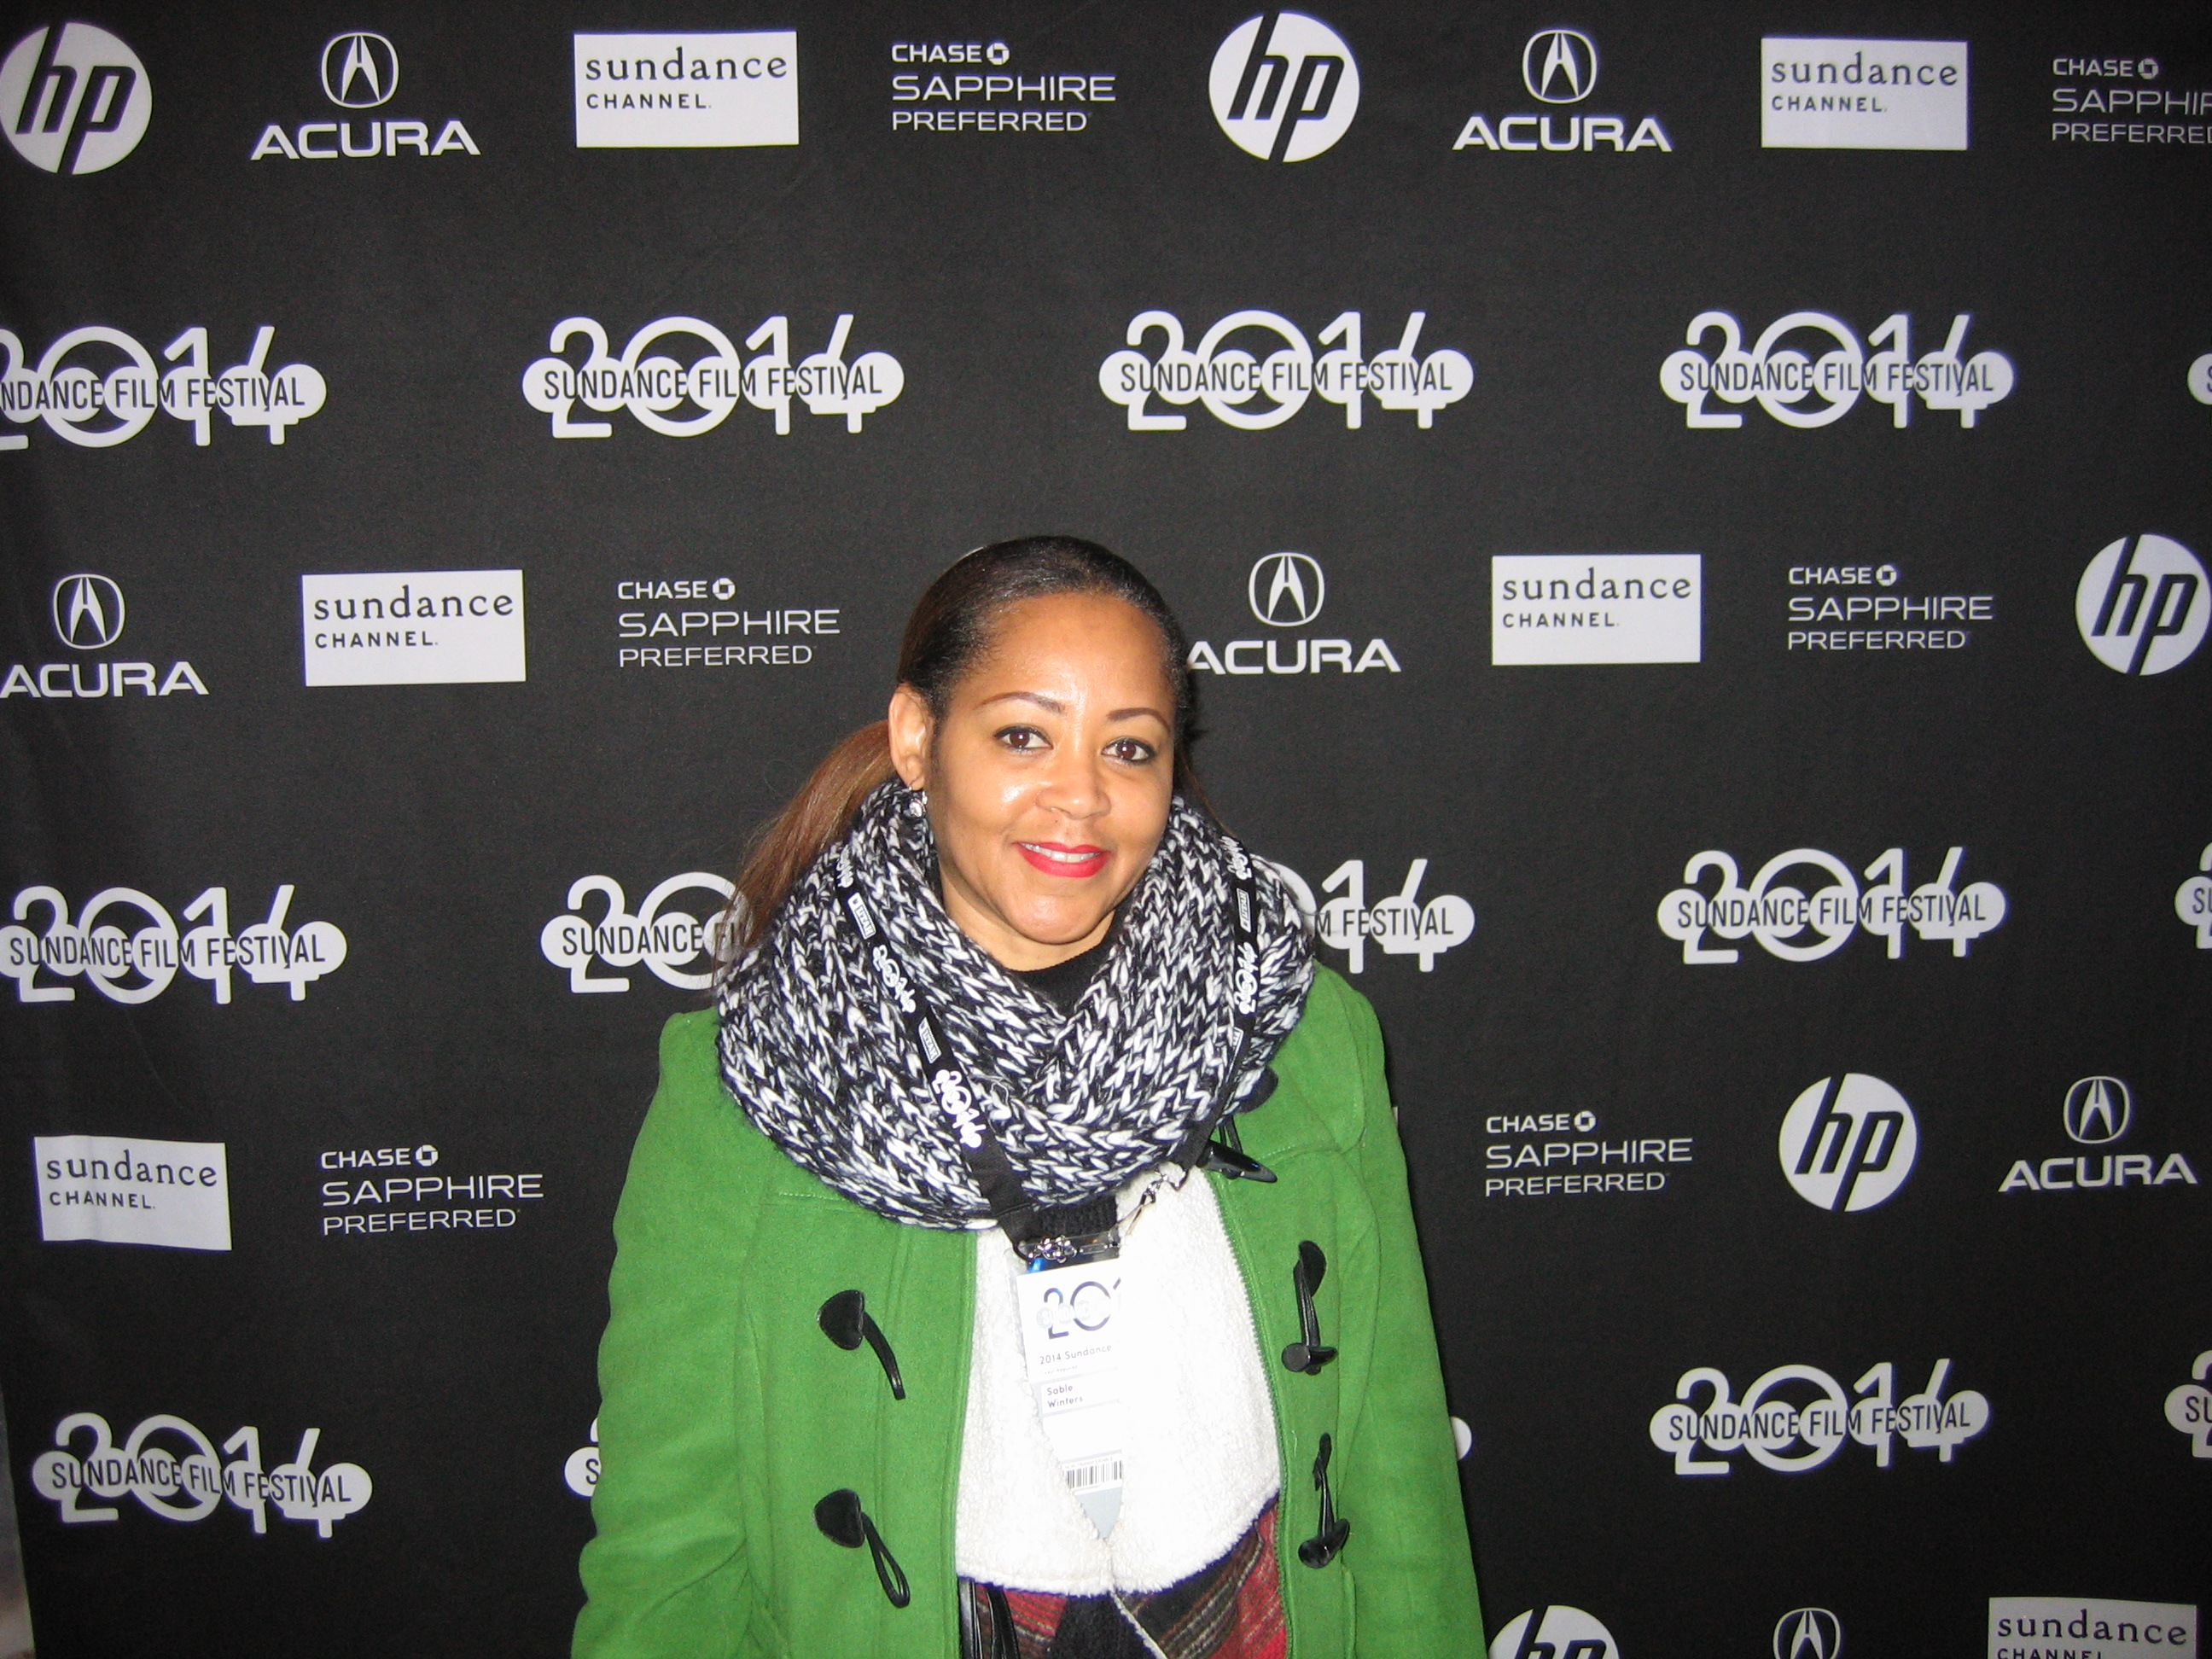 Sundance 2014, Park City, UT